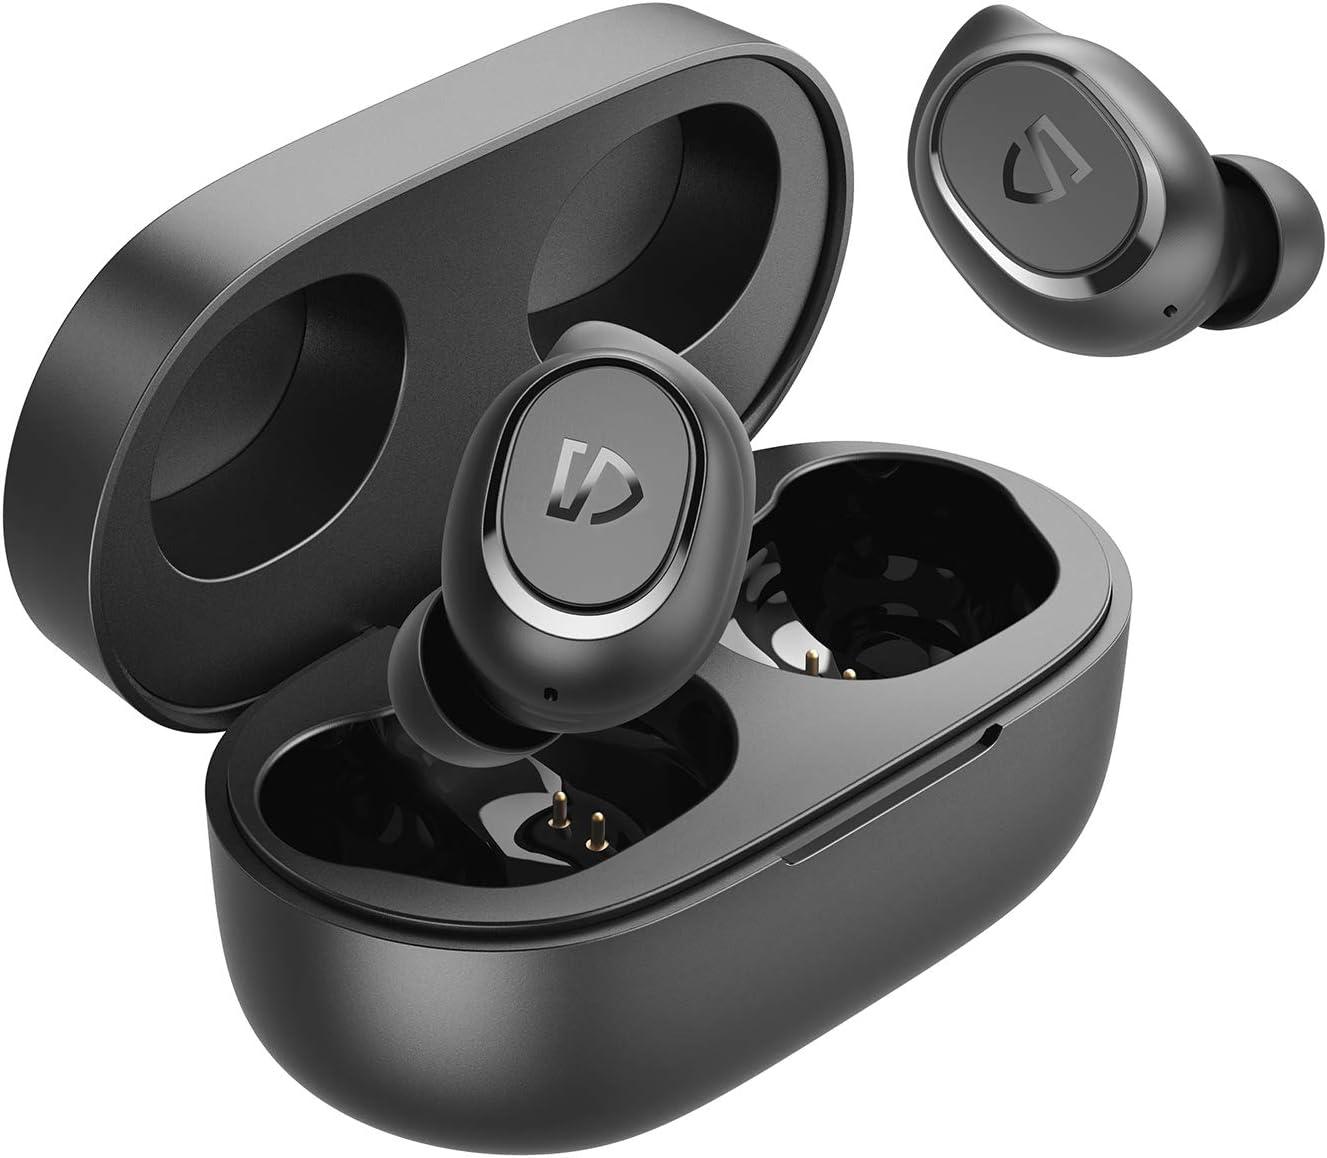 SoundPEATS Wireless Earbuds TrueFree2 Bluetooth 5.0 Headphones in-Ear Stereo TWS Sports Earbuds, IPX7 Waterproof, Customized Ear Fins, USB-C Charge, Monaural/Binaural Calls, 20 Hours Playtime